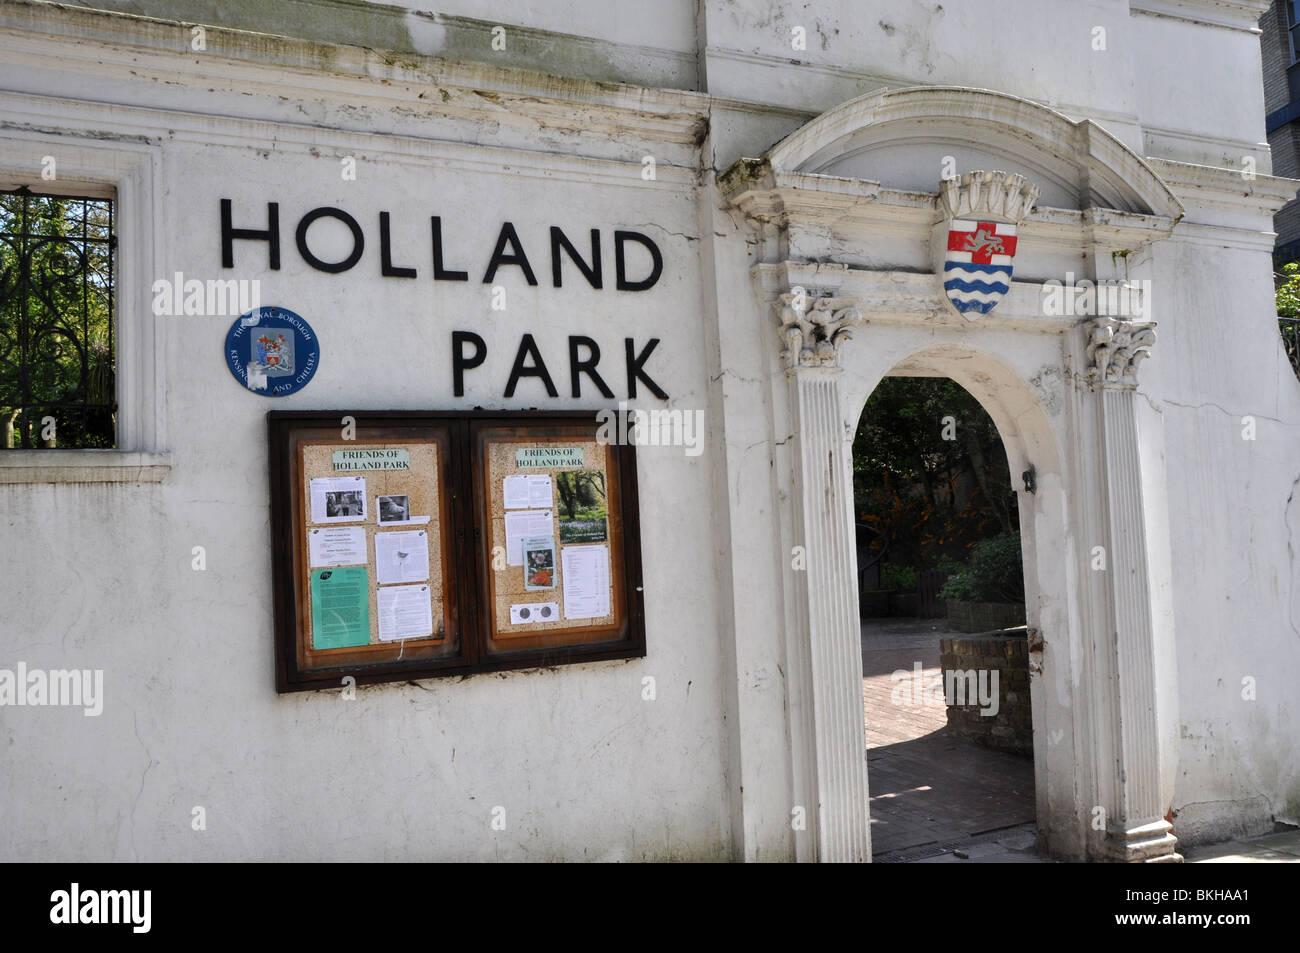 Entrance to London's Holland Park UK - Stock Image